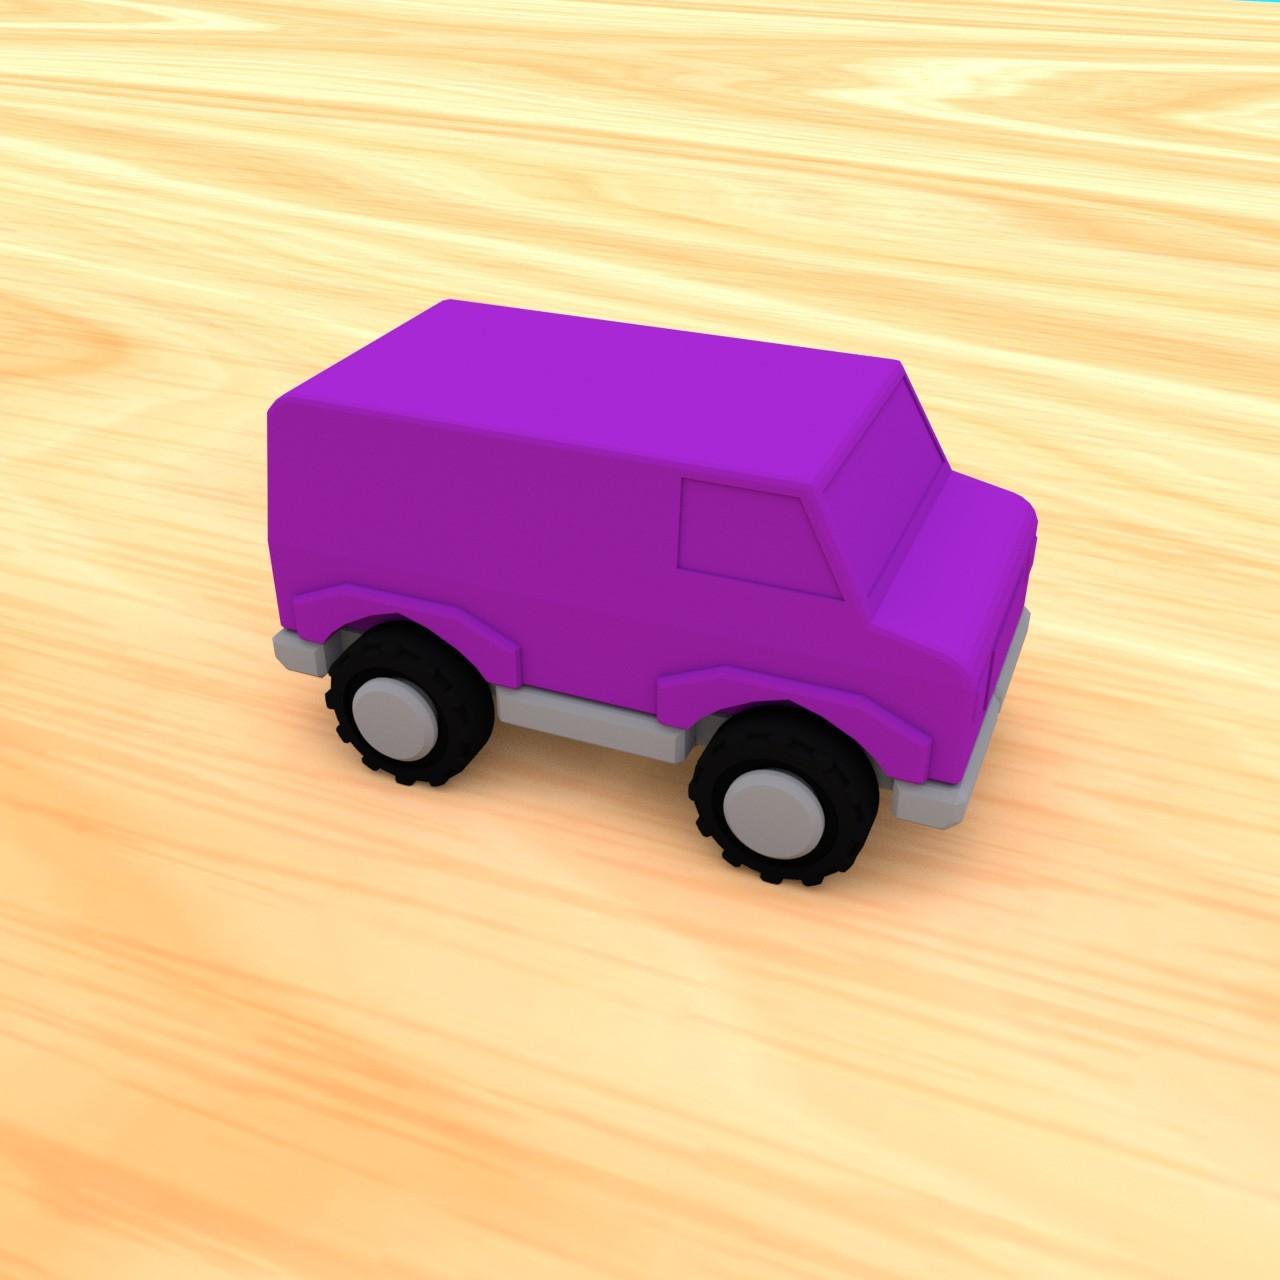 smalltoys-carspack09.jpg Download STL file SmallToys - Cars pack • 3D print design, Wabby